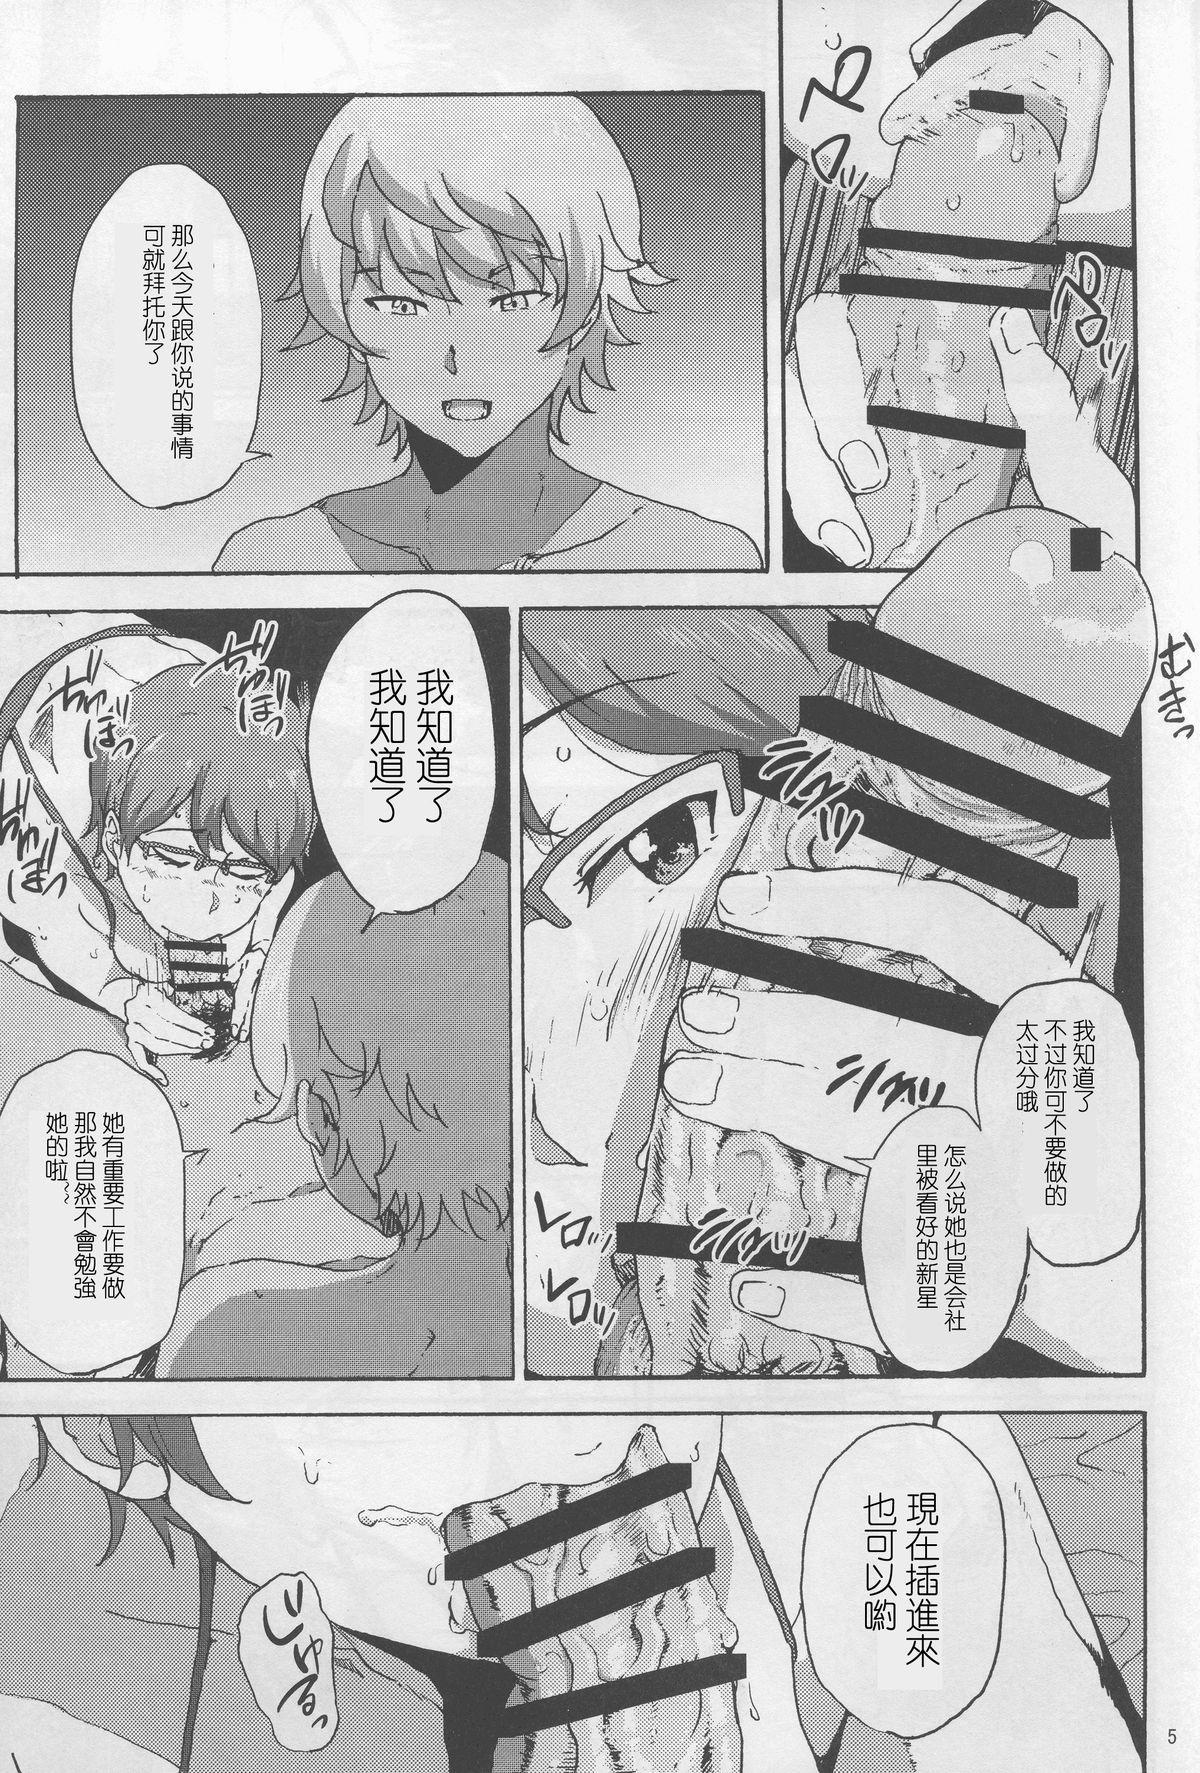 Mirai-chan ga Sandaime SGOCK no Leader ni Damasare Yarechau Hon 5